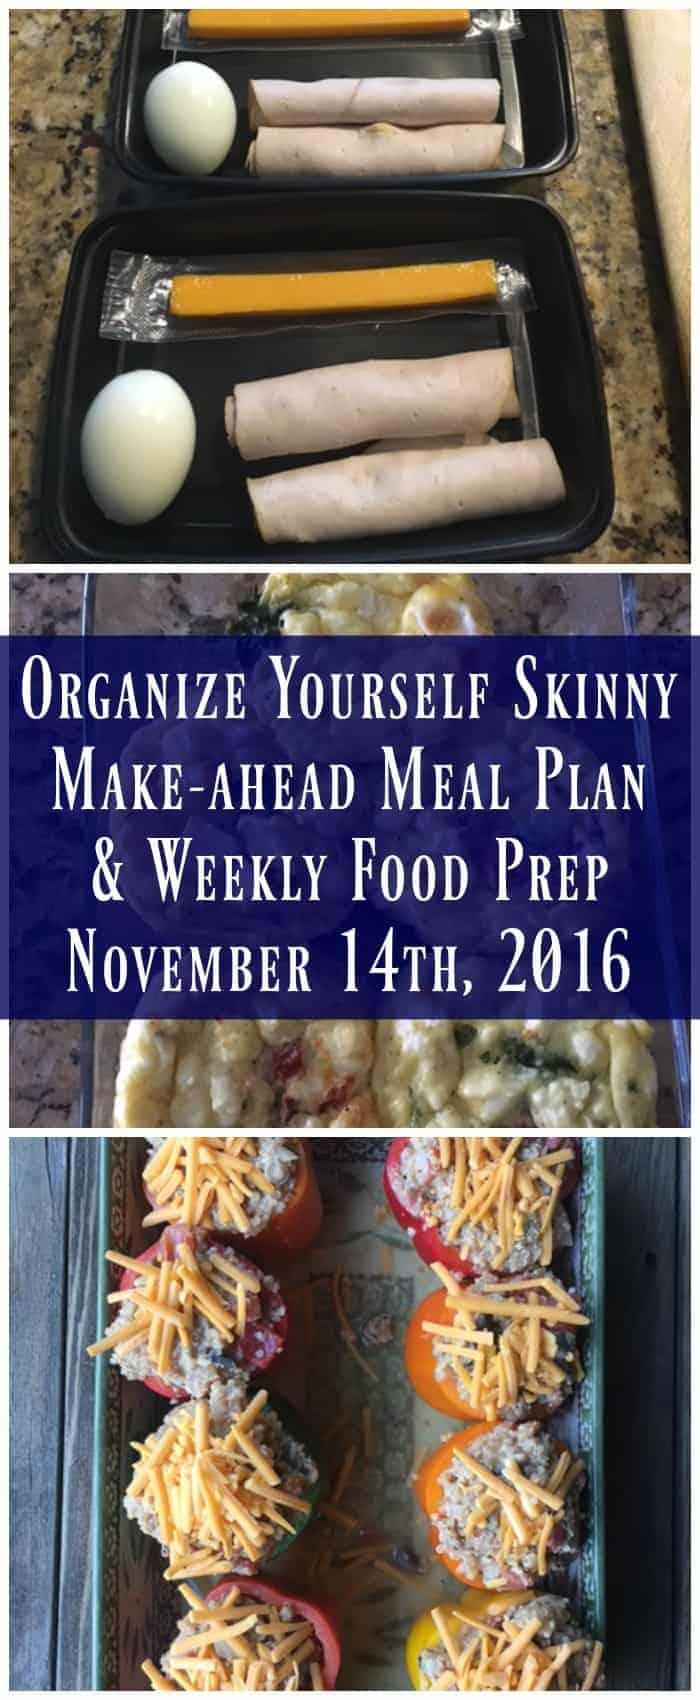 Make-ahead meal plan & weekly food prep for November 14th, 2016